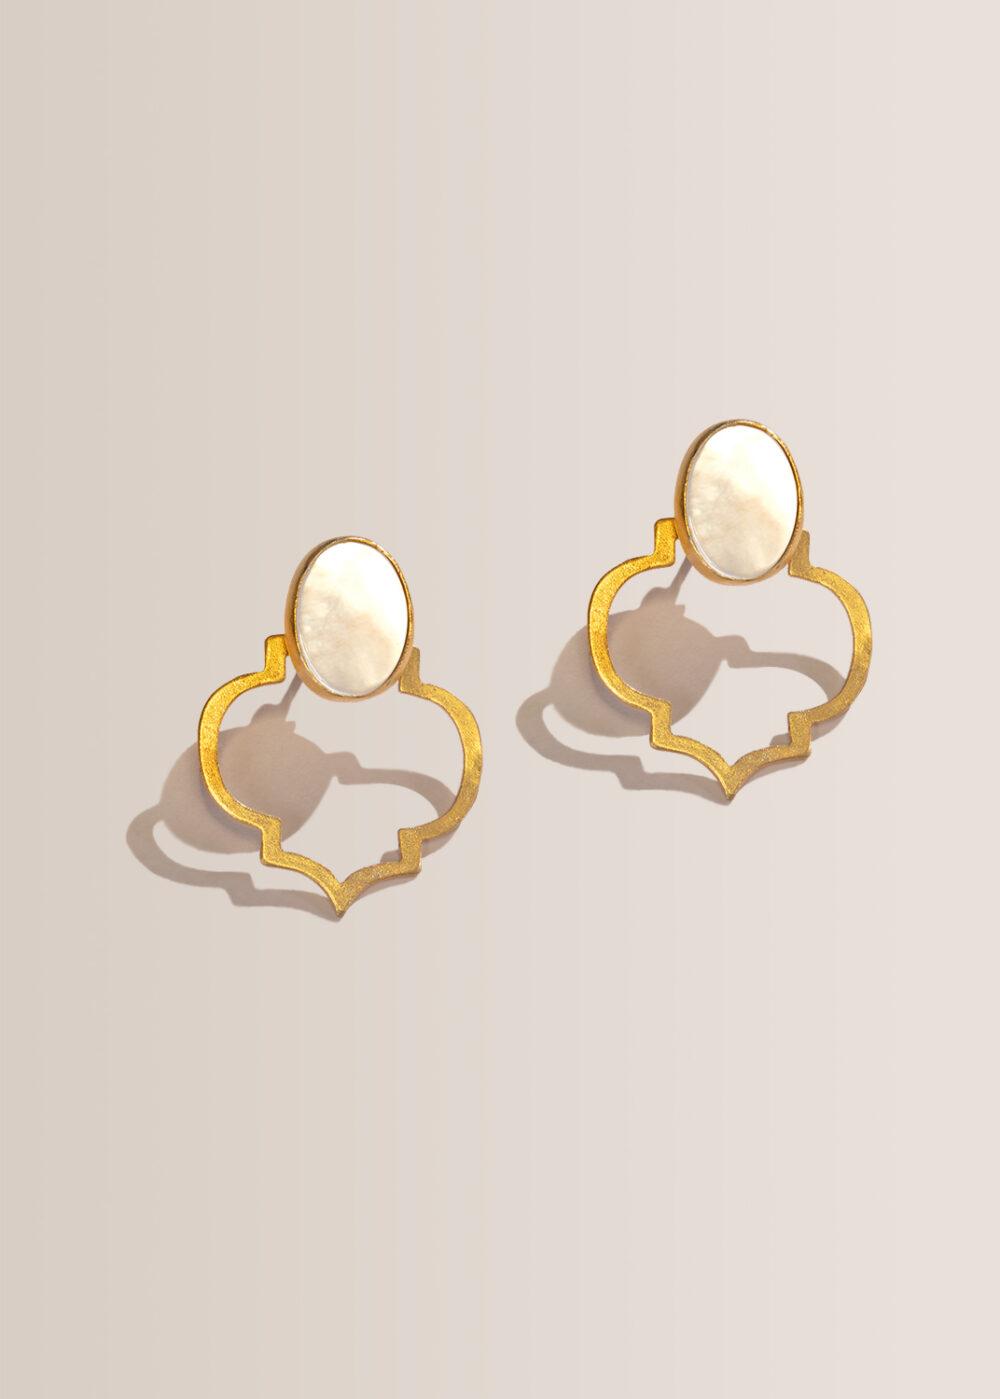 helia-ornament-ohrring-gold-perlmutt